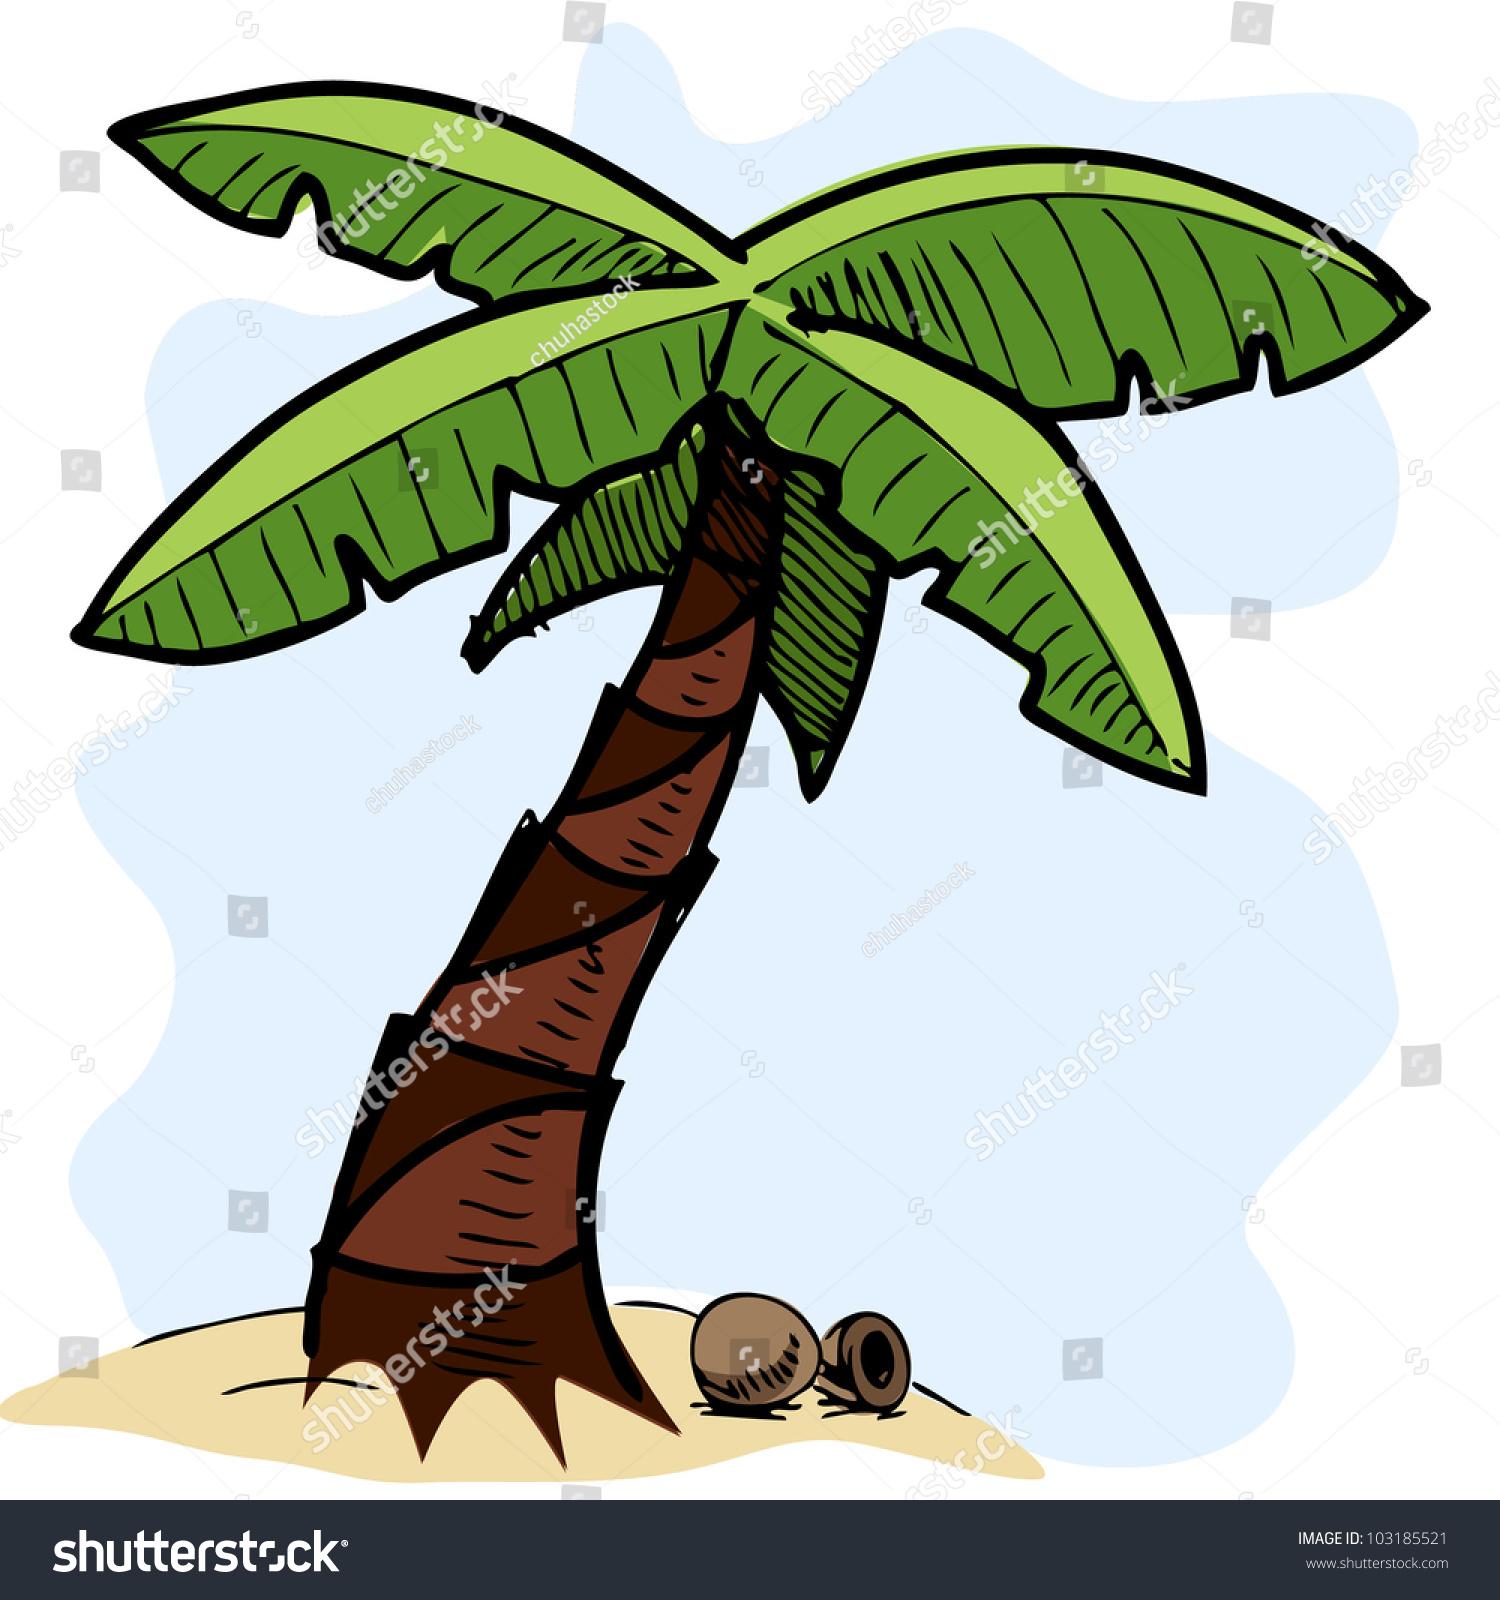 Tropical Palm Tree Coconuts Hand Drawing Stock Vector ...  Hawaiian Palm Tree Drawings